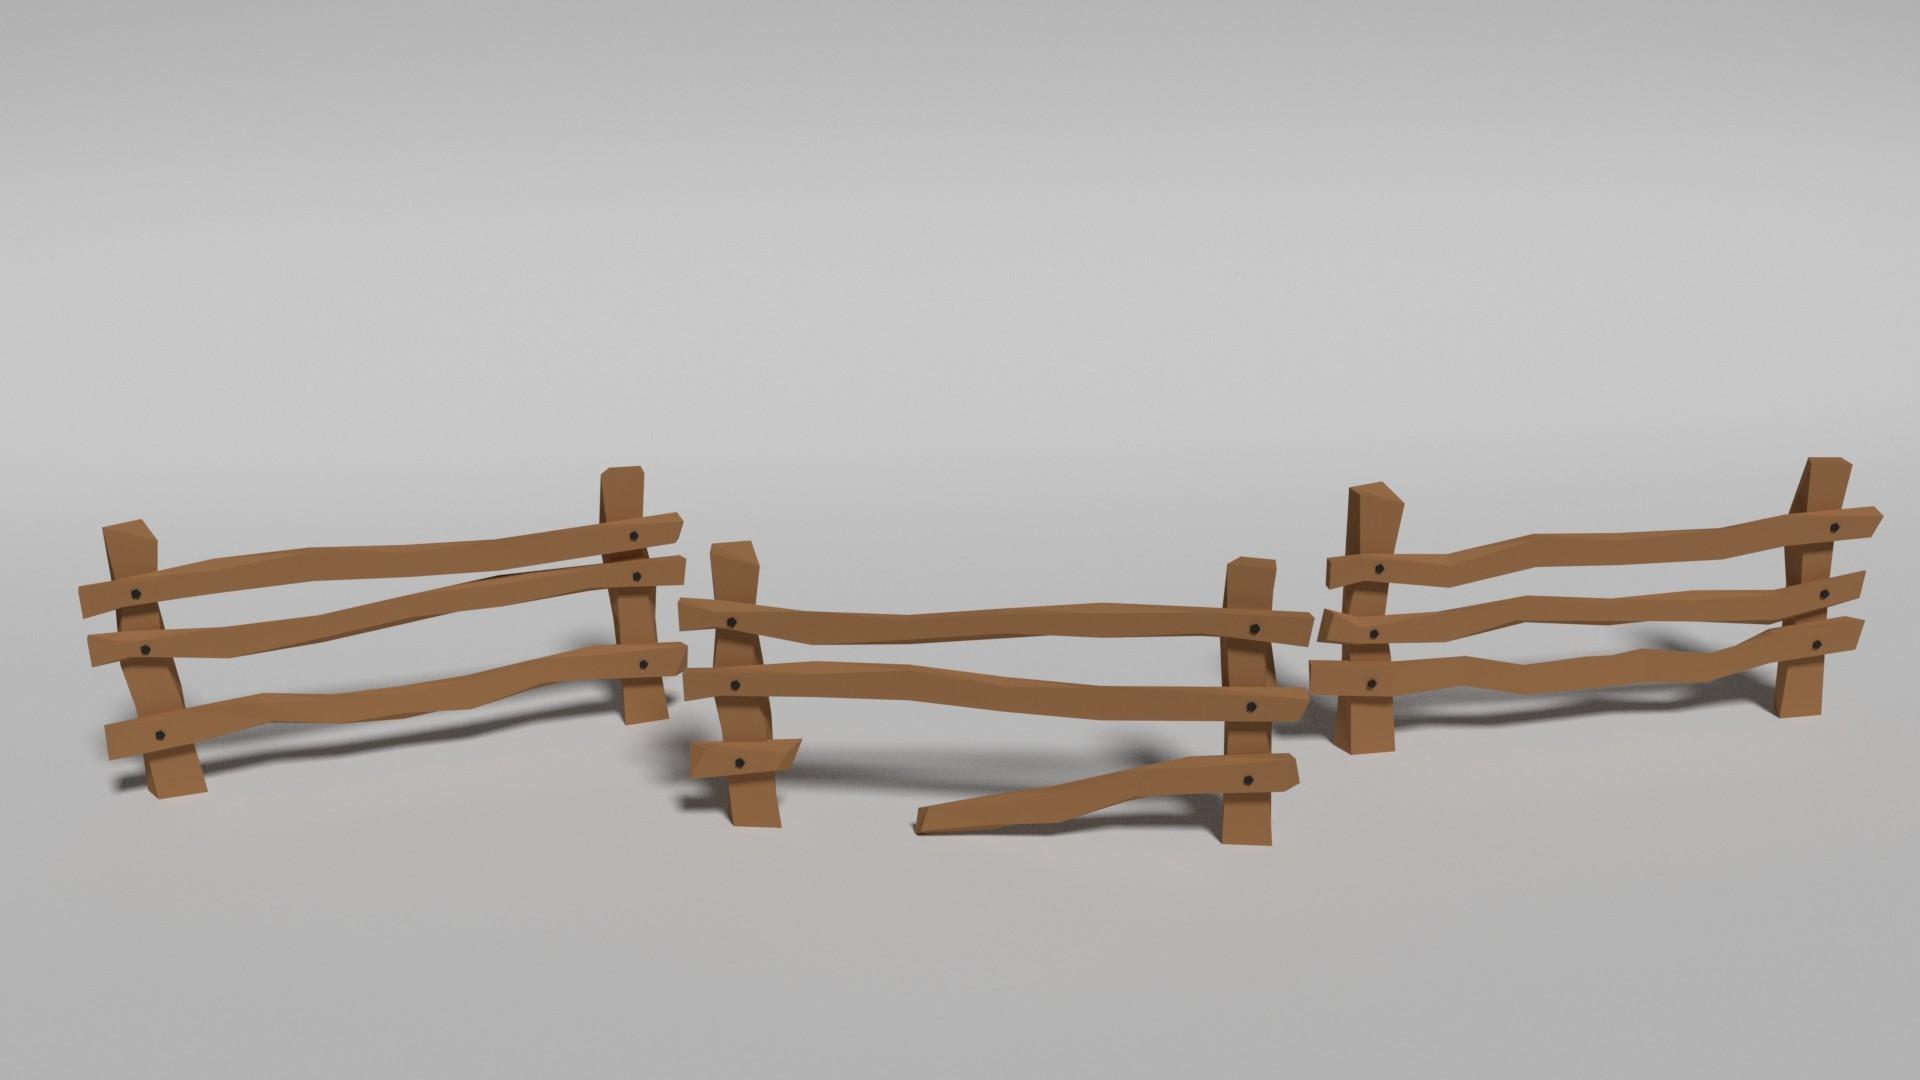 ArtStation - Low Poly Fences, Nichole John Romero